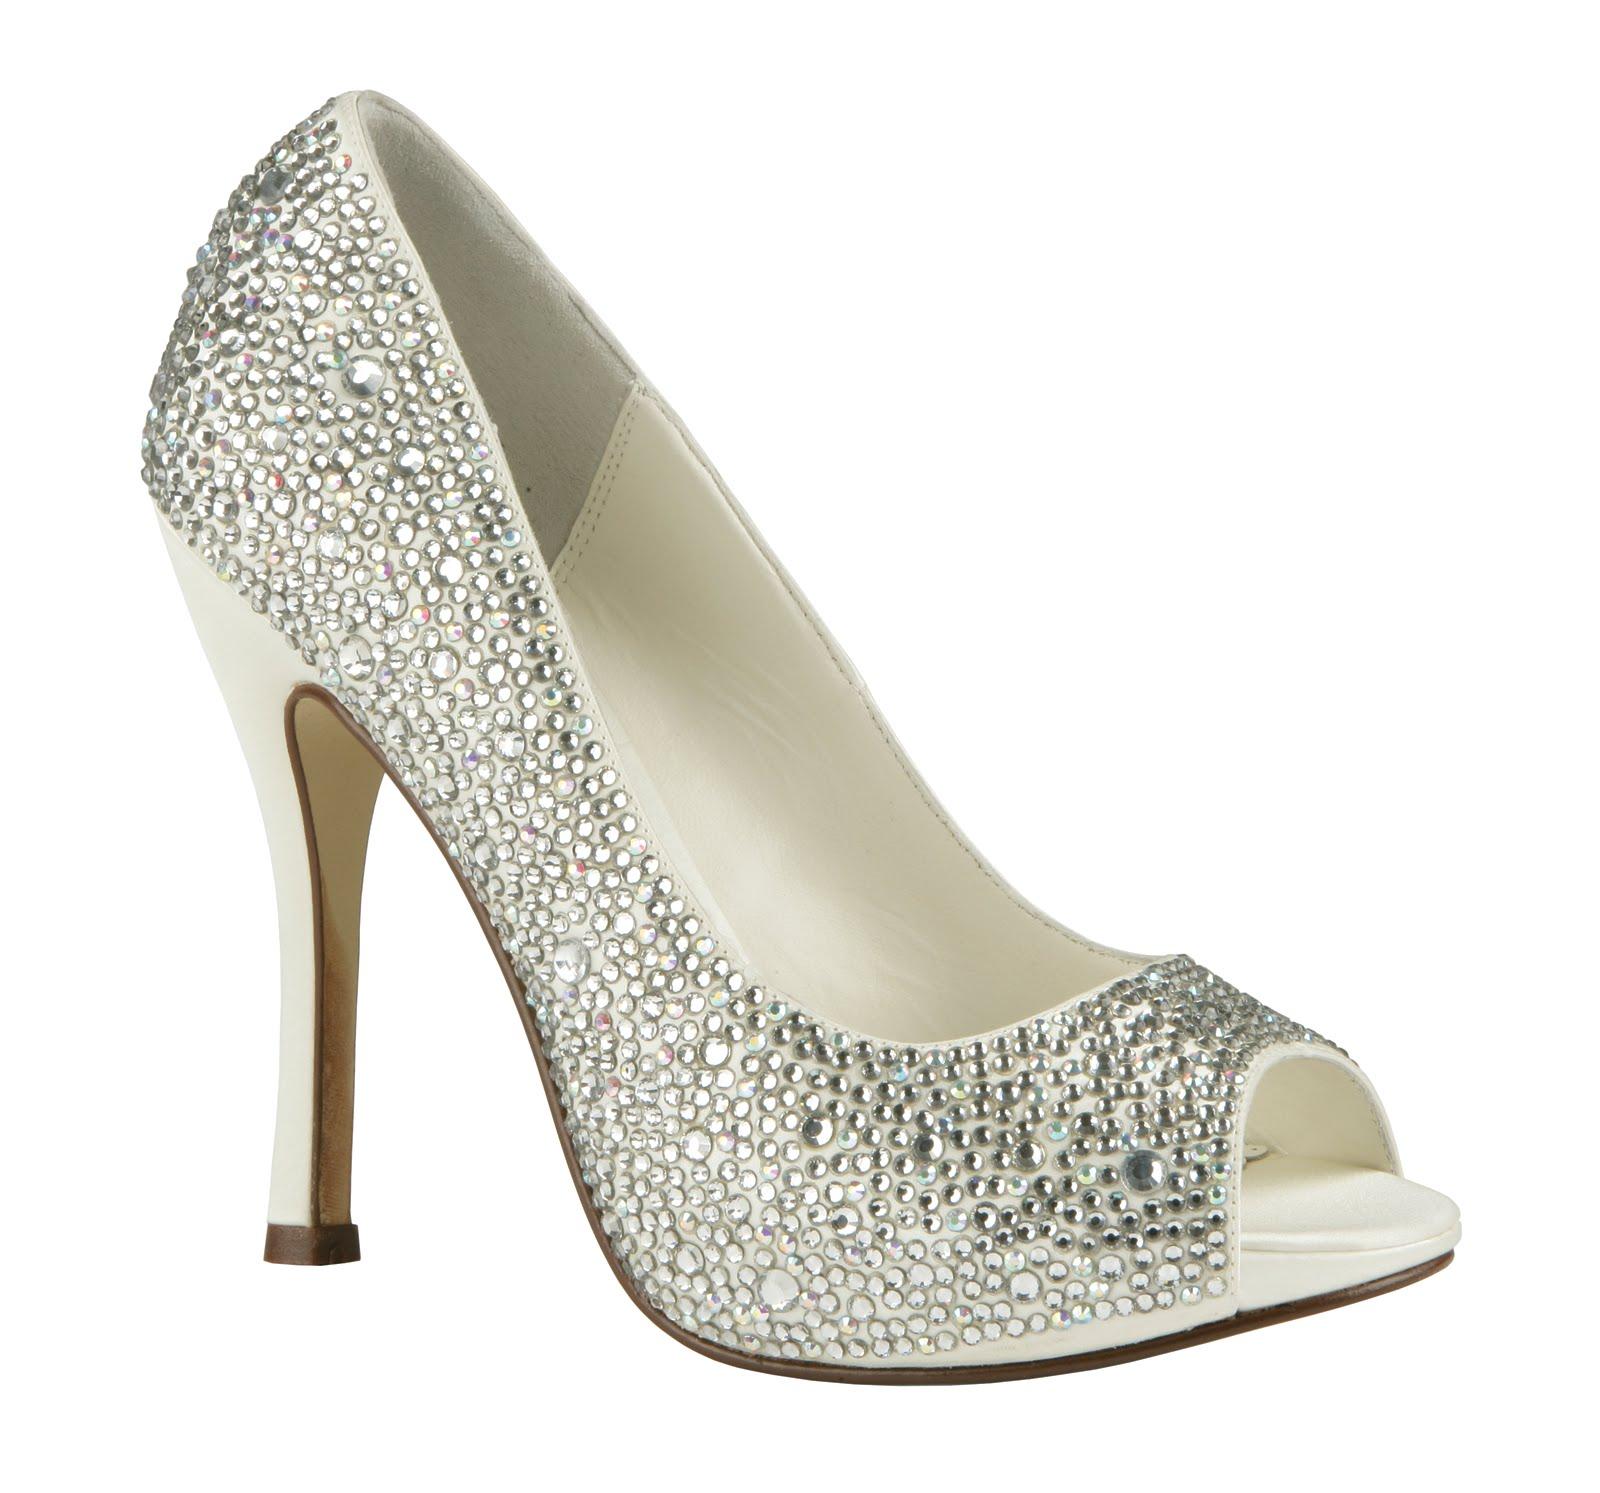 Bridal shoes bling ring